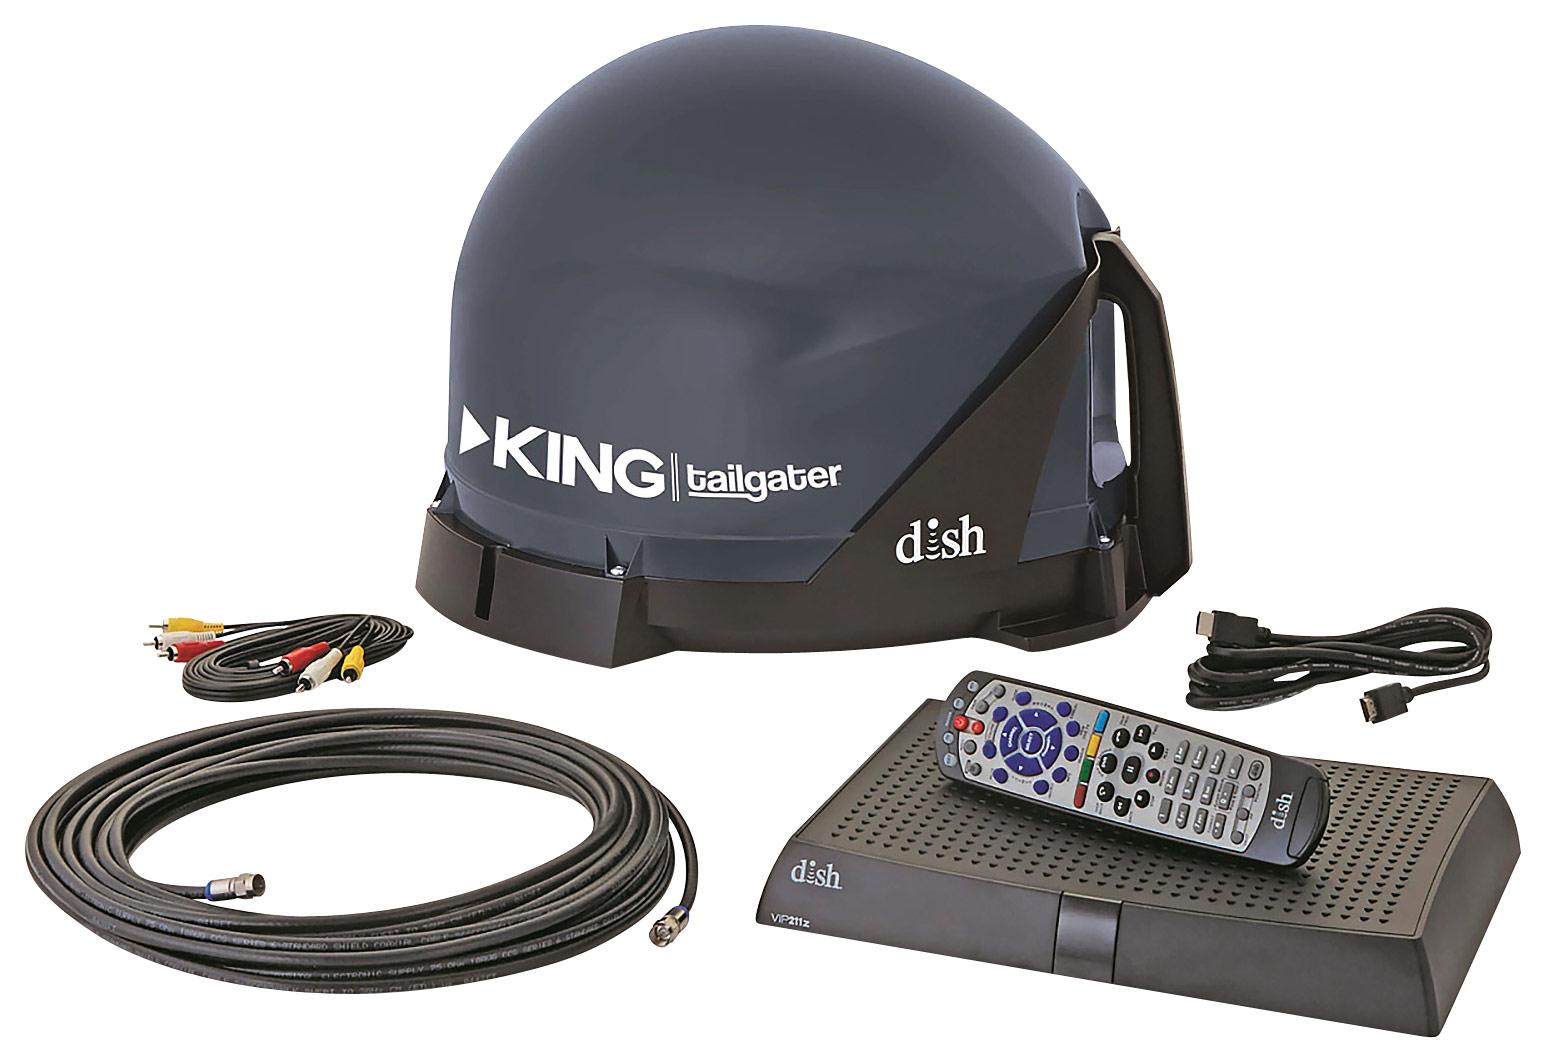 King - Tailgater Portable Satellite TV System - Black